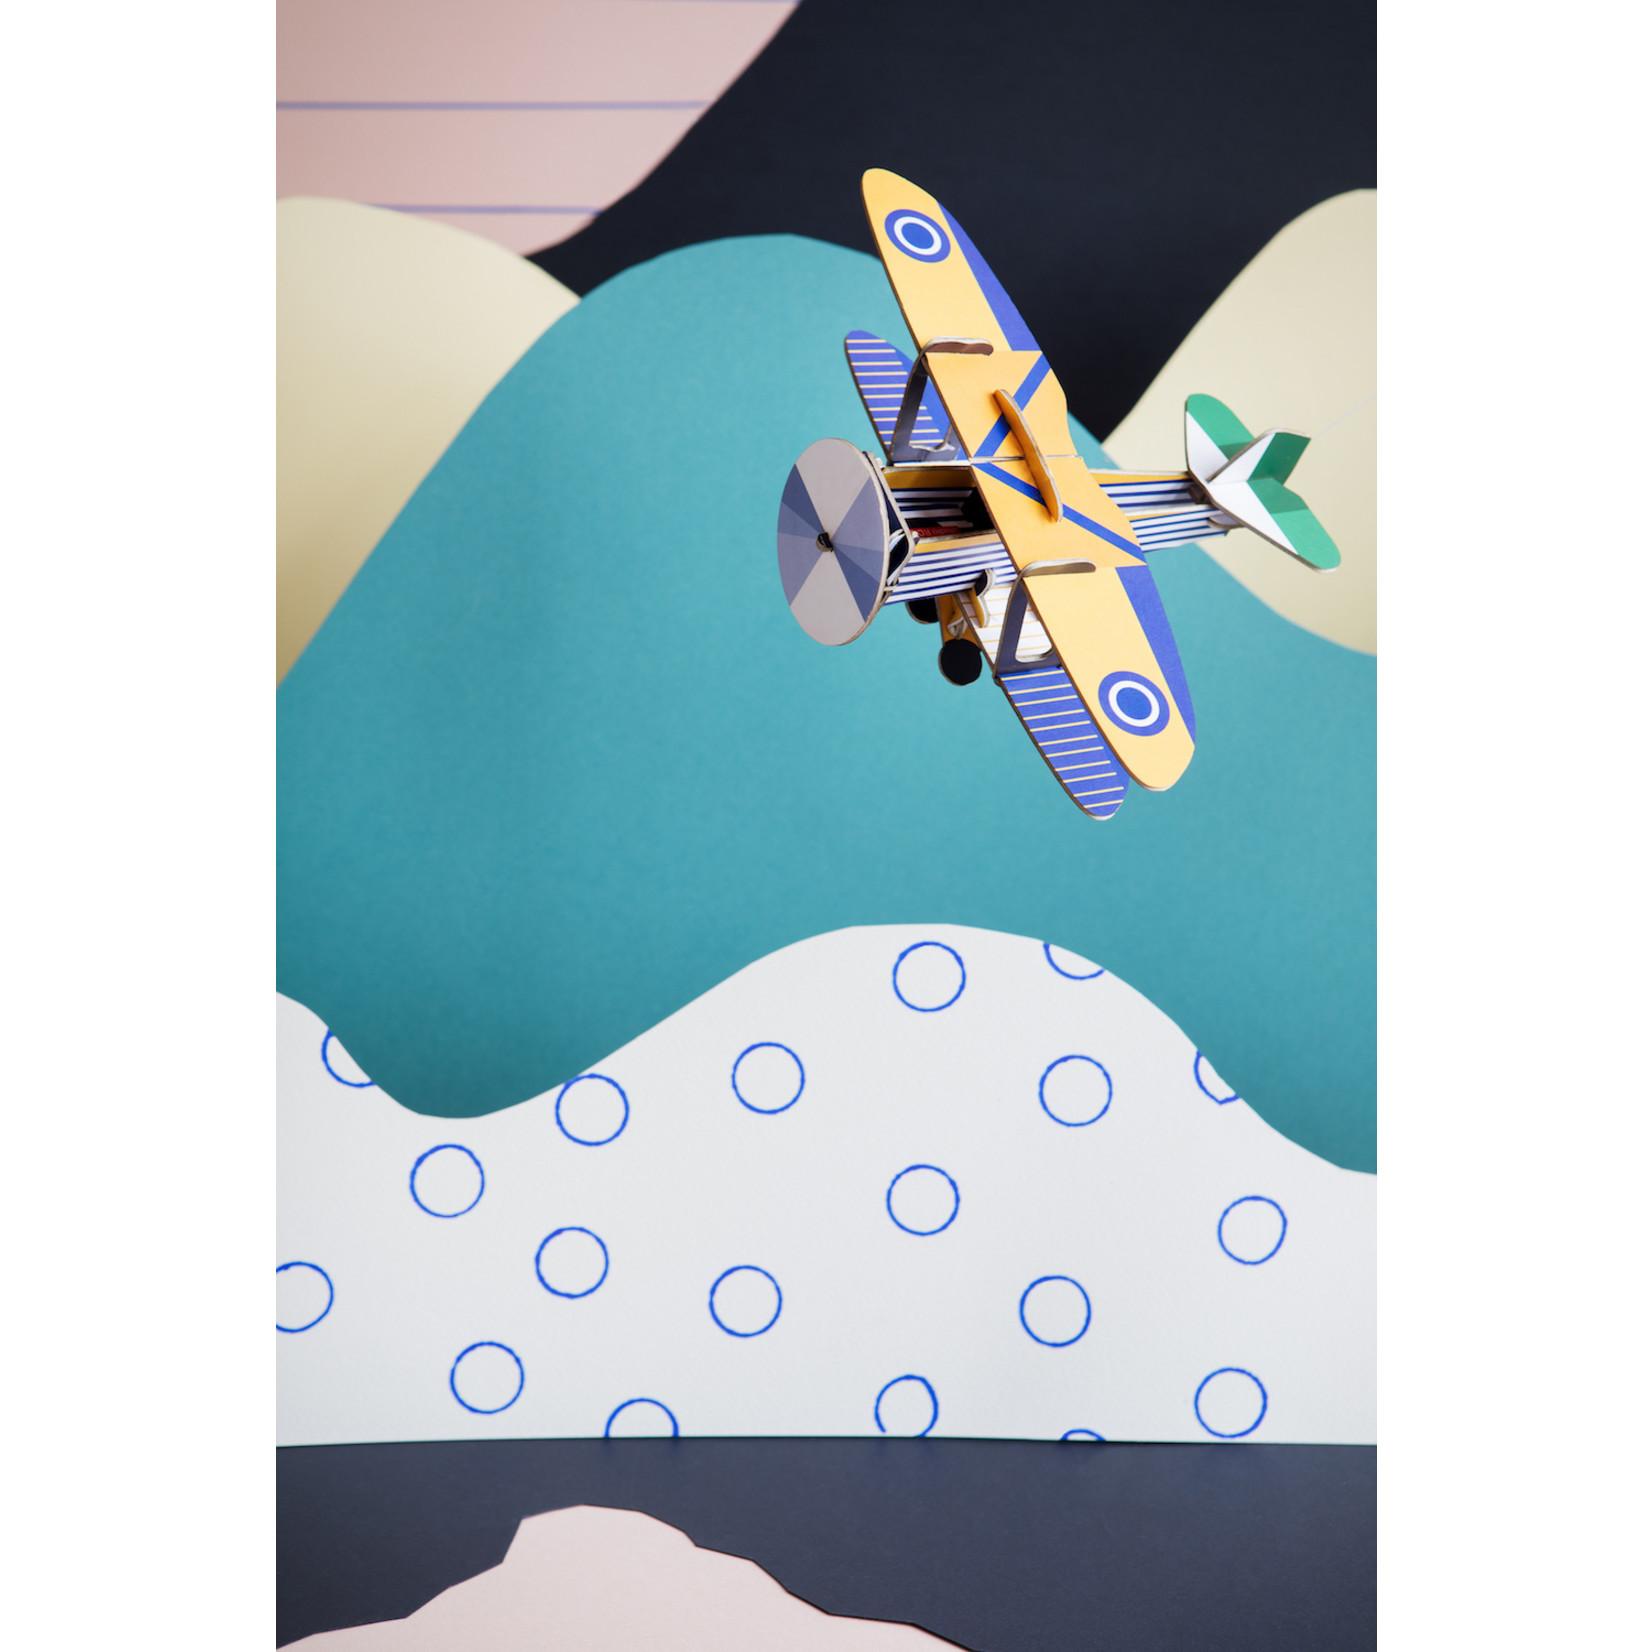 Studio Roof STUDIO ROOF - Cool Classic Plane - Goshawk